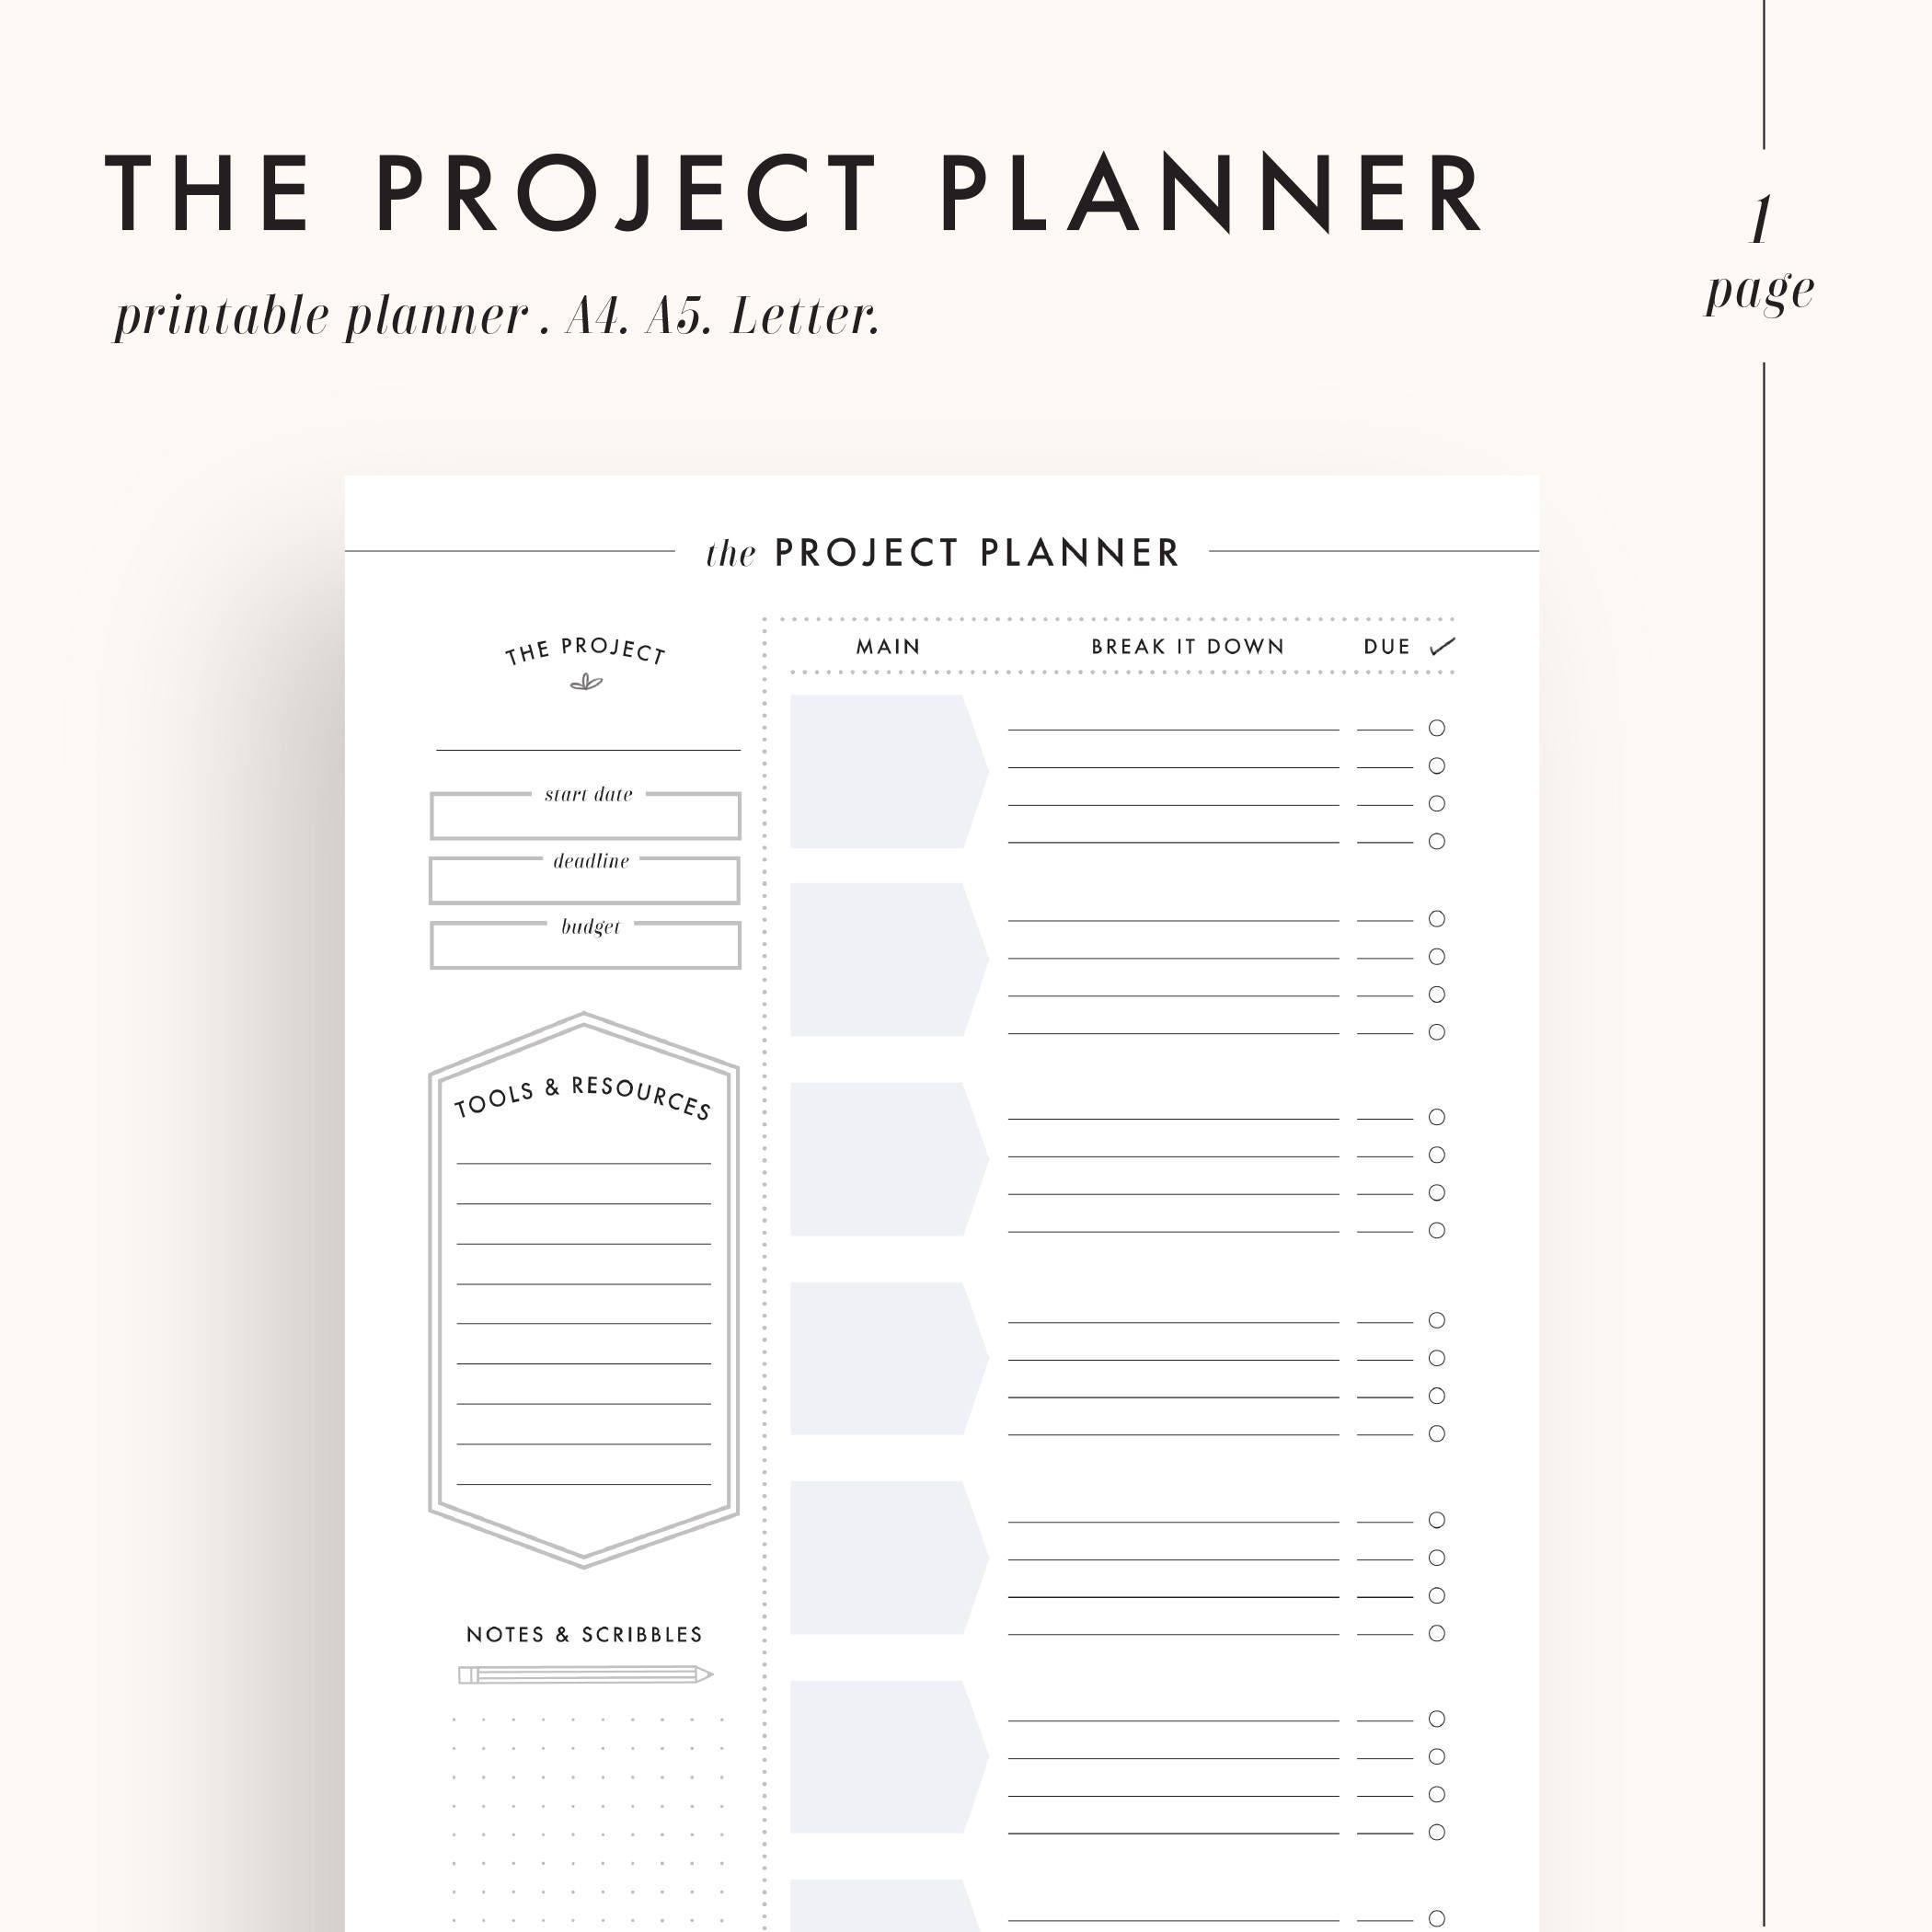 project planner productivity planner project management